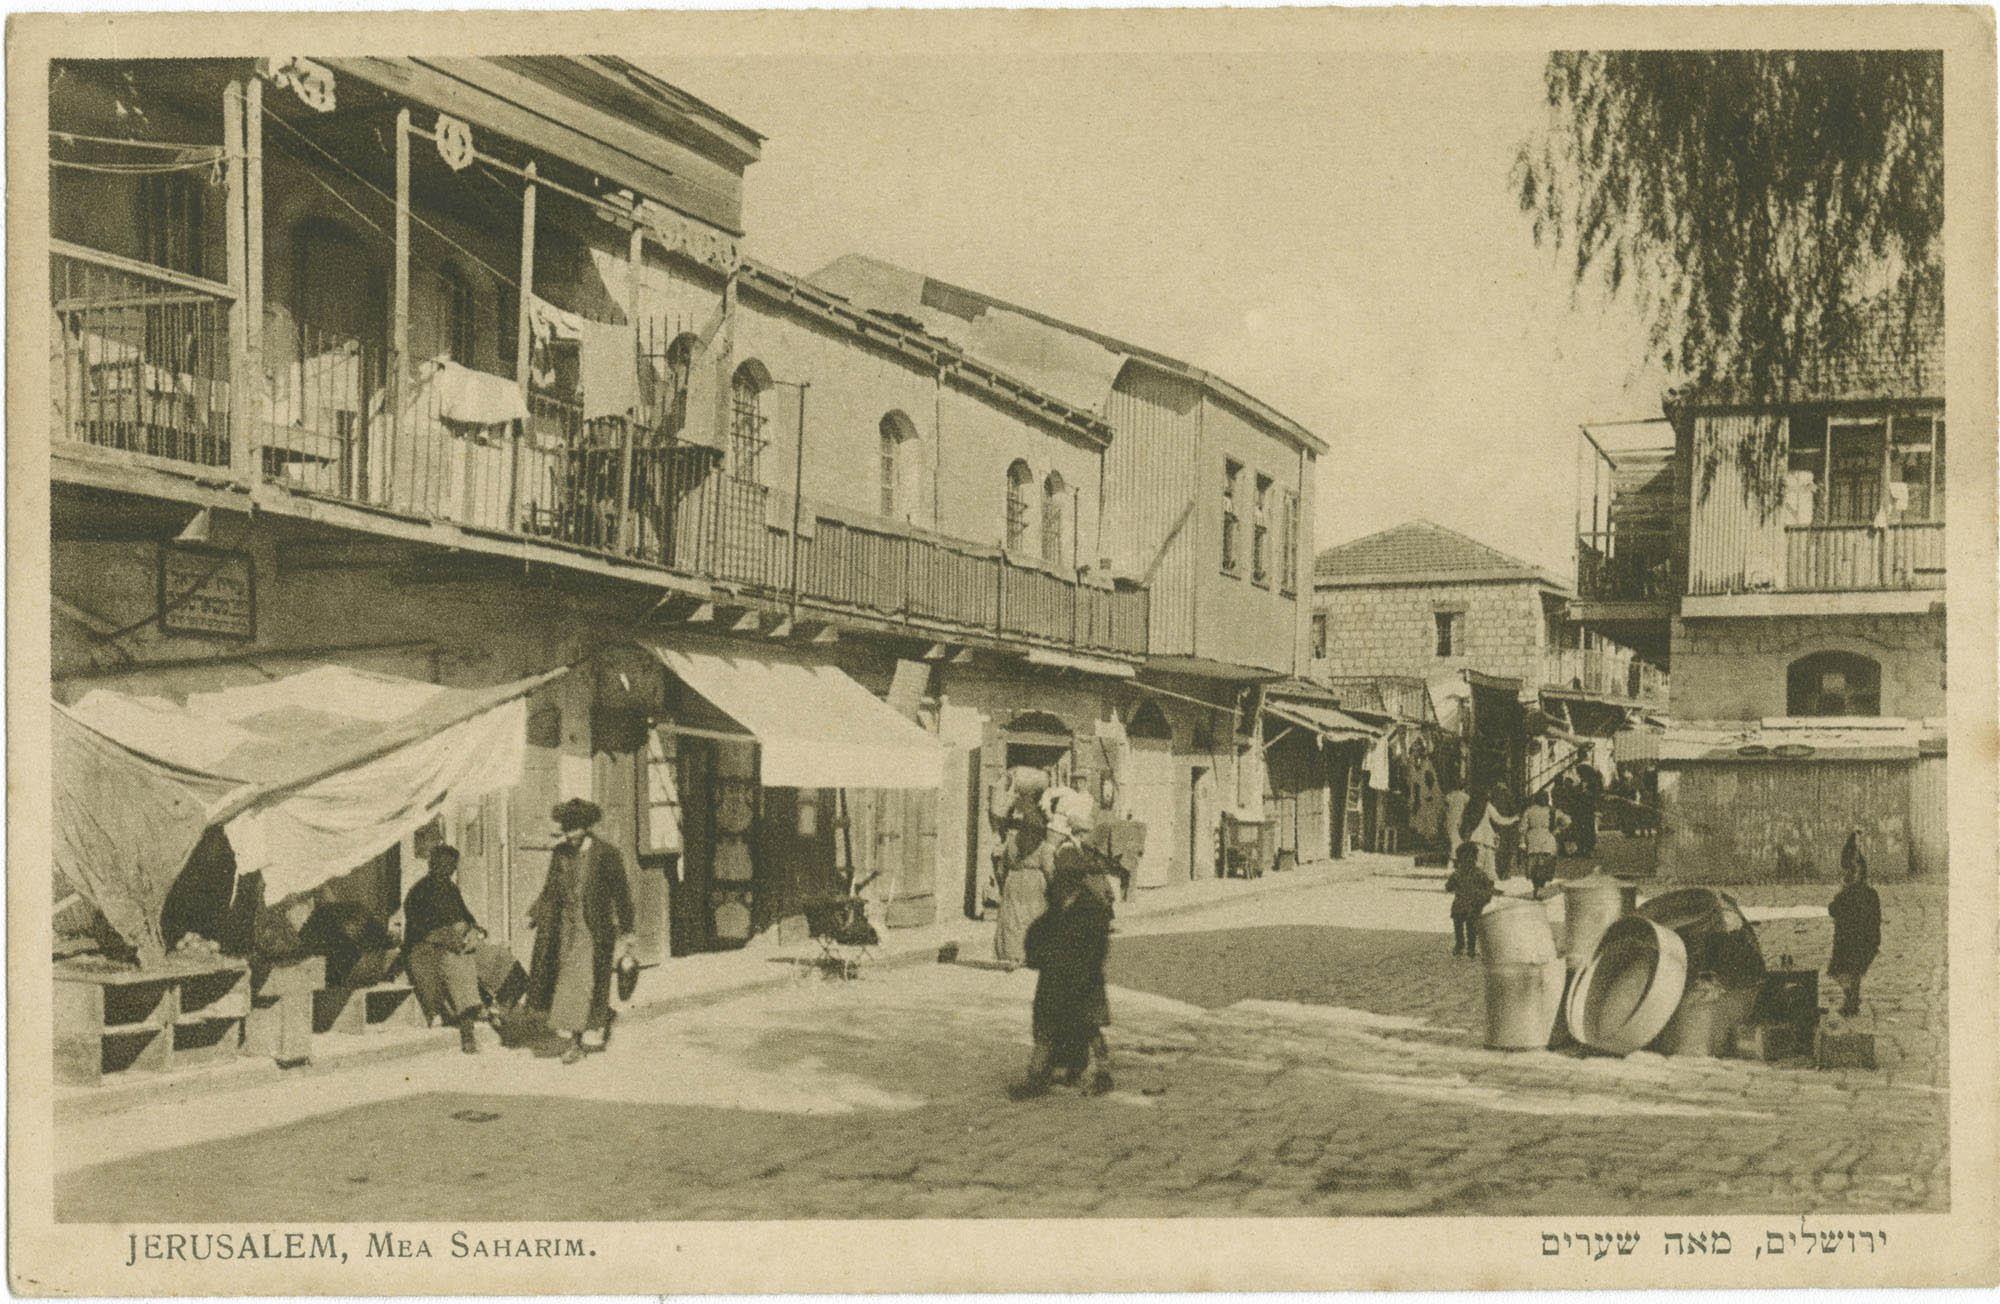 Jerusalem, Mea Saharim / ירושלים, מאה שערים